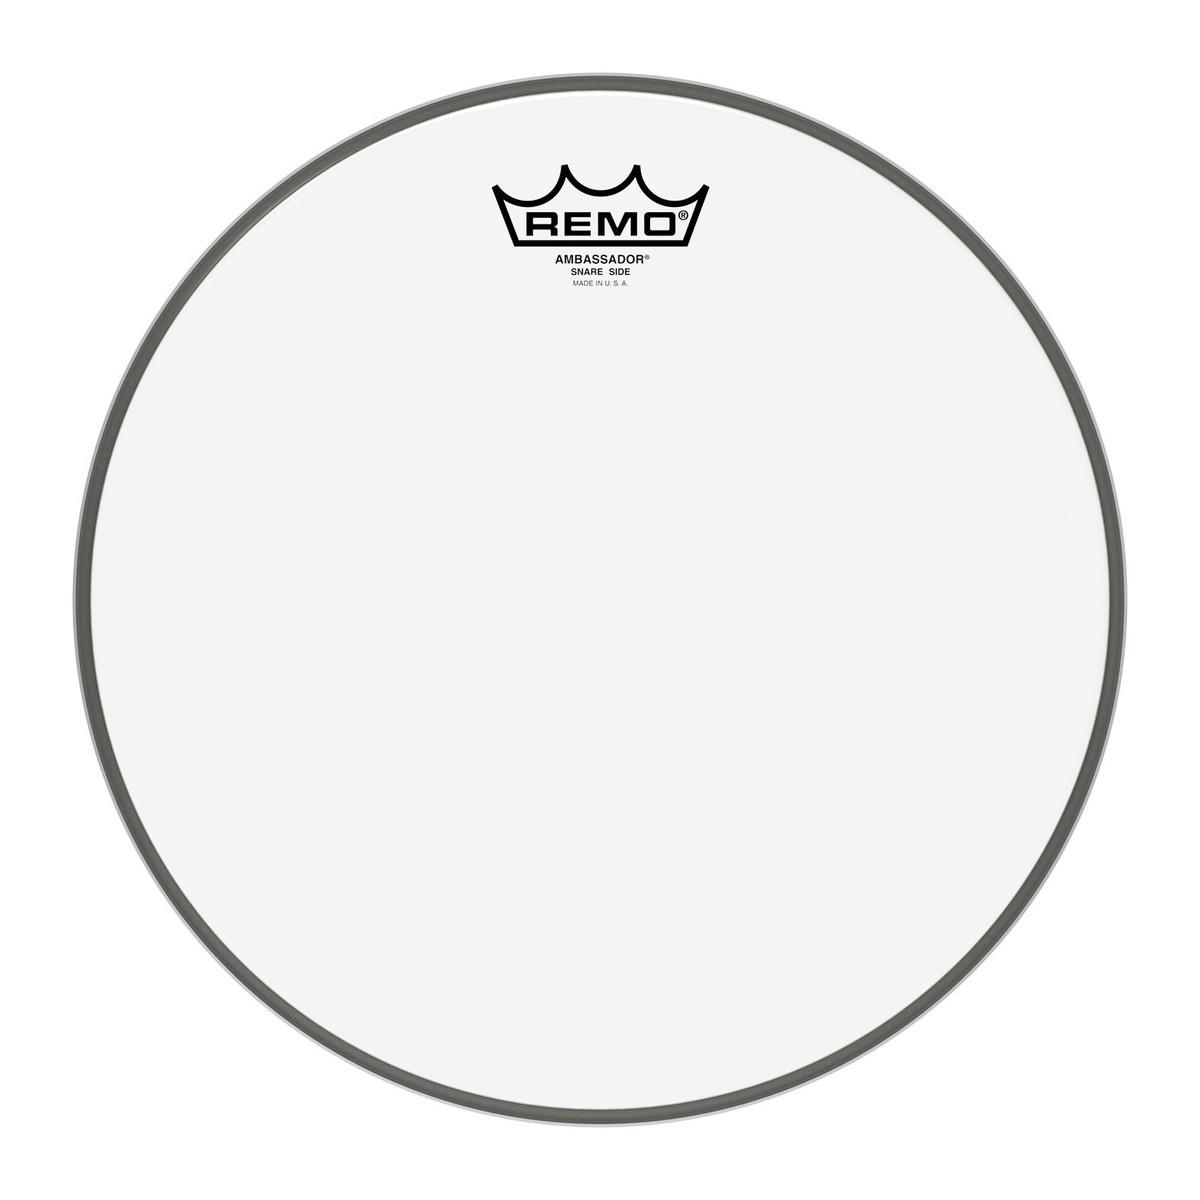 Remo Ambassador Hazy Snare Side 12 Drum Head